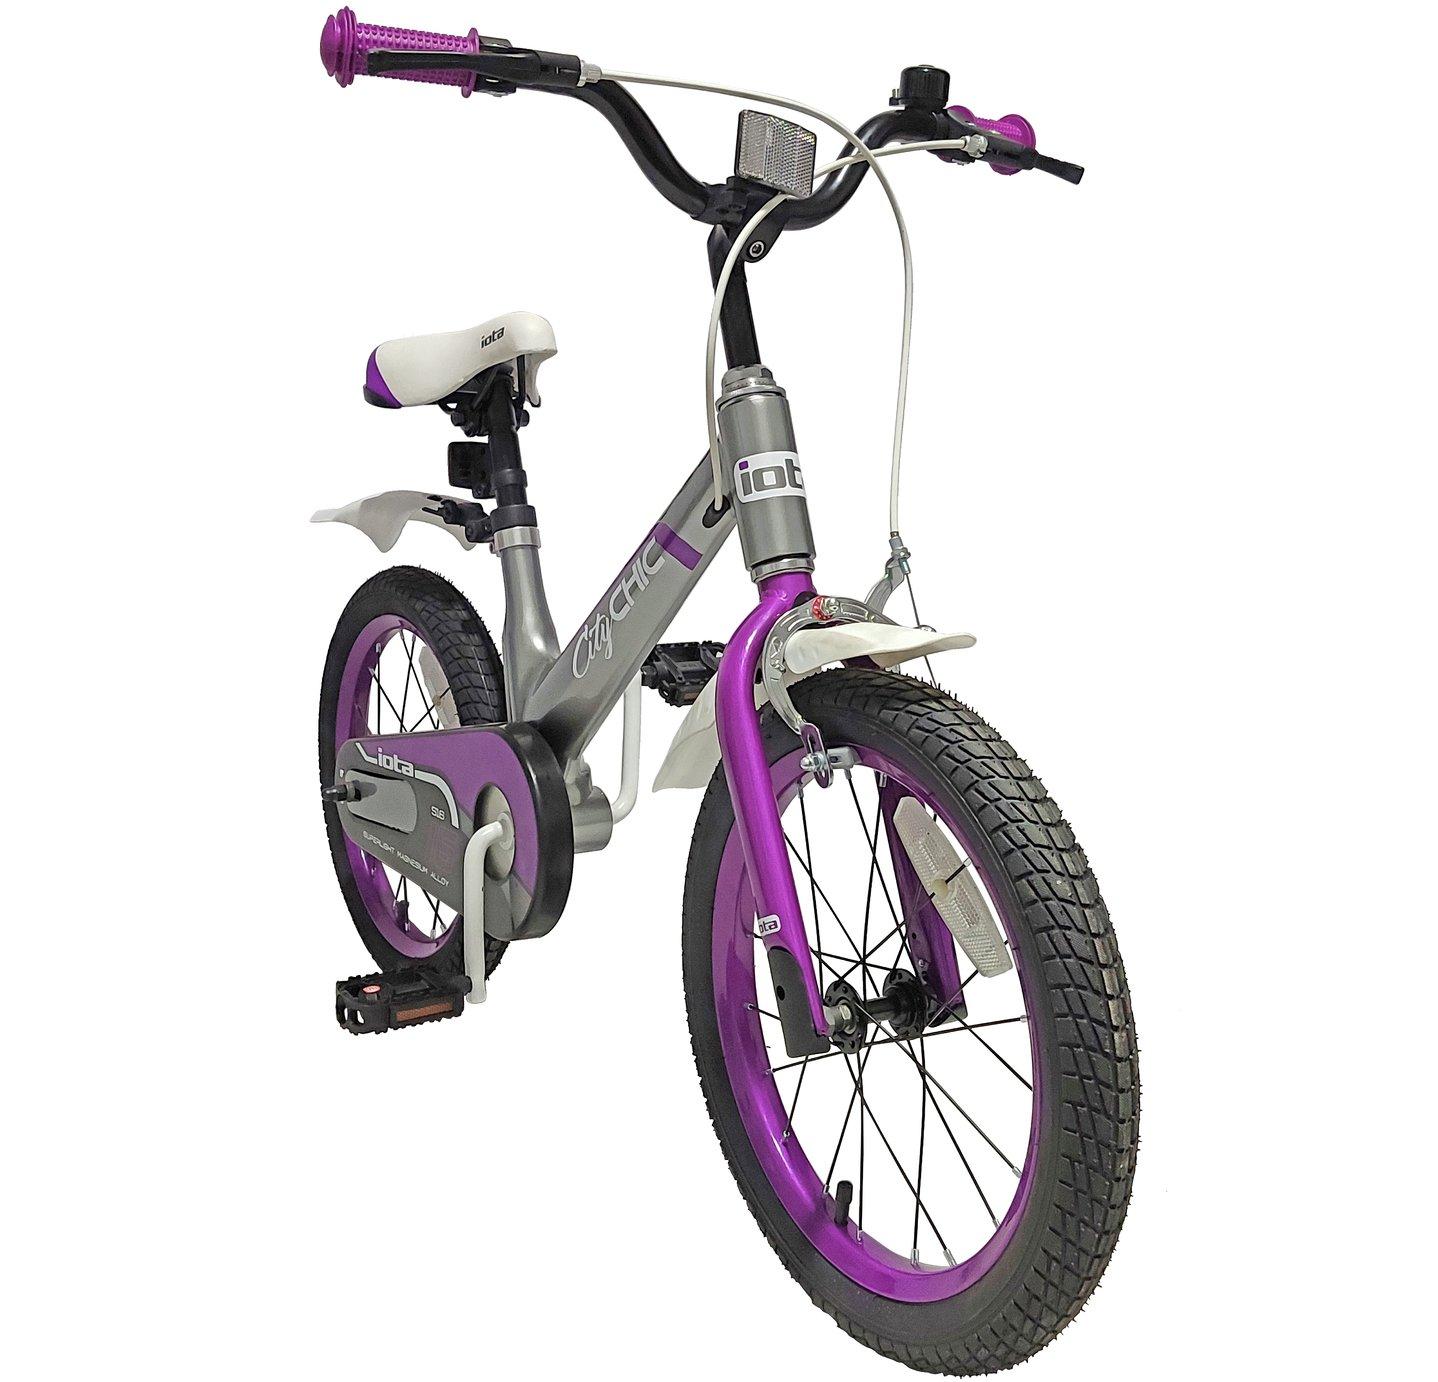 Iota City Chic 16 inch Wheel Size Alloy Kid's Bike